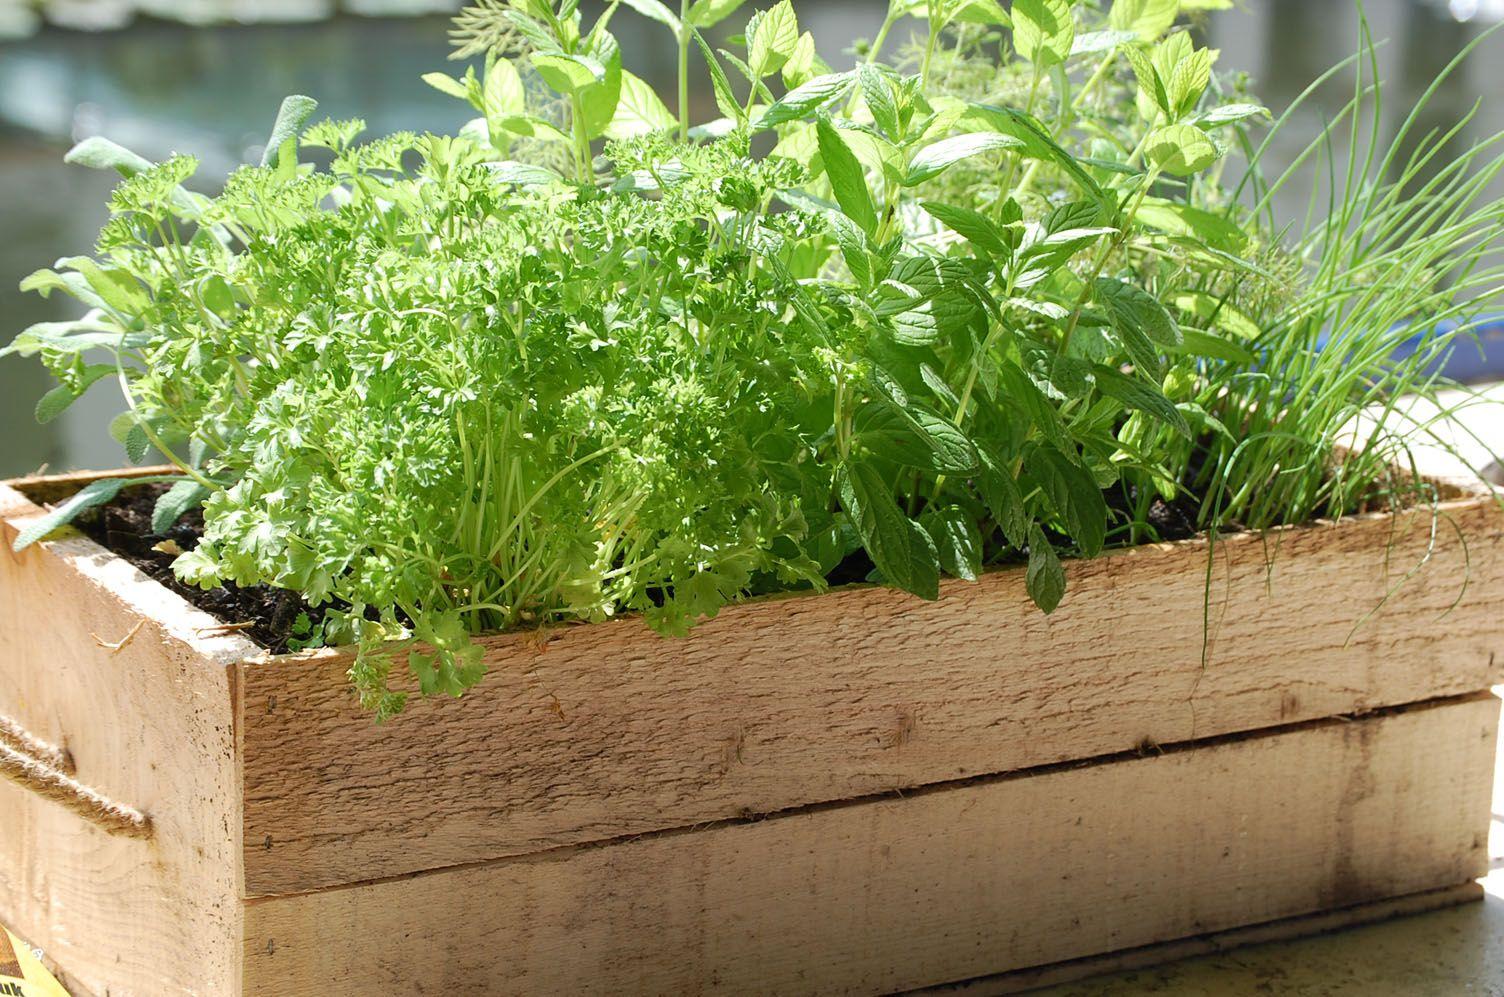 Landscaping With Herbs : Herb gardens herbs garden gardening planting tips